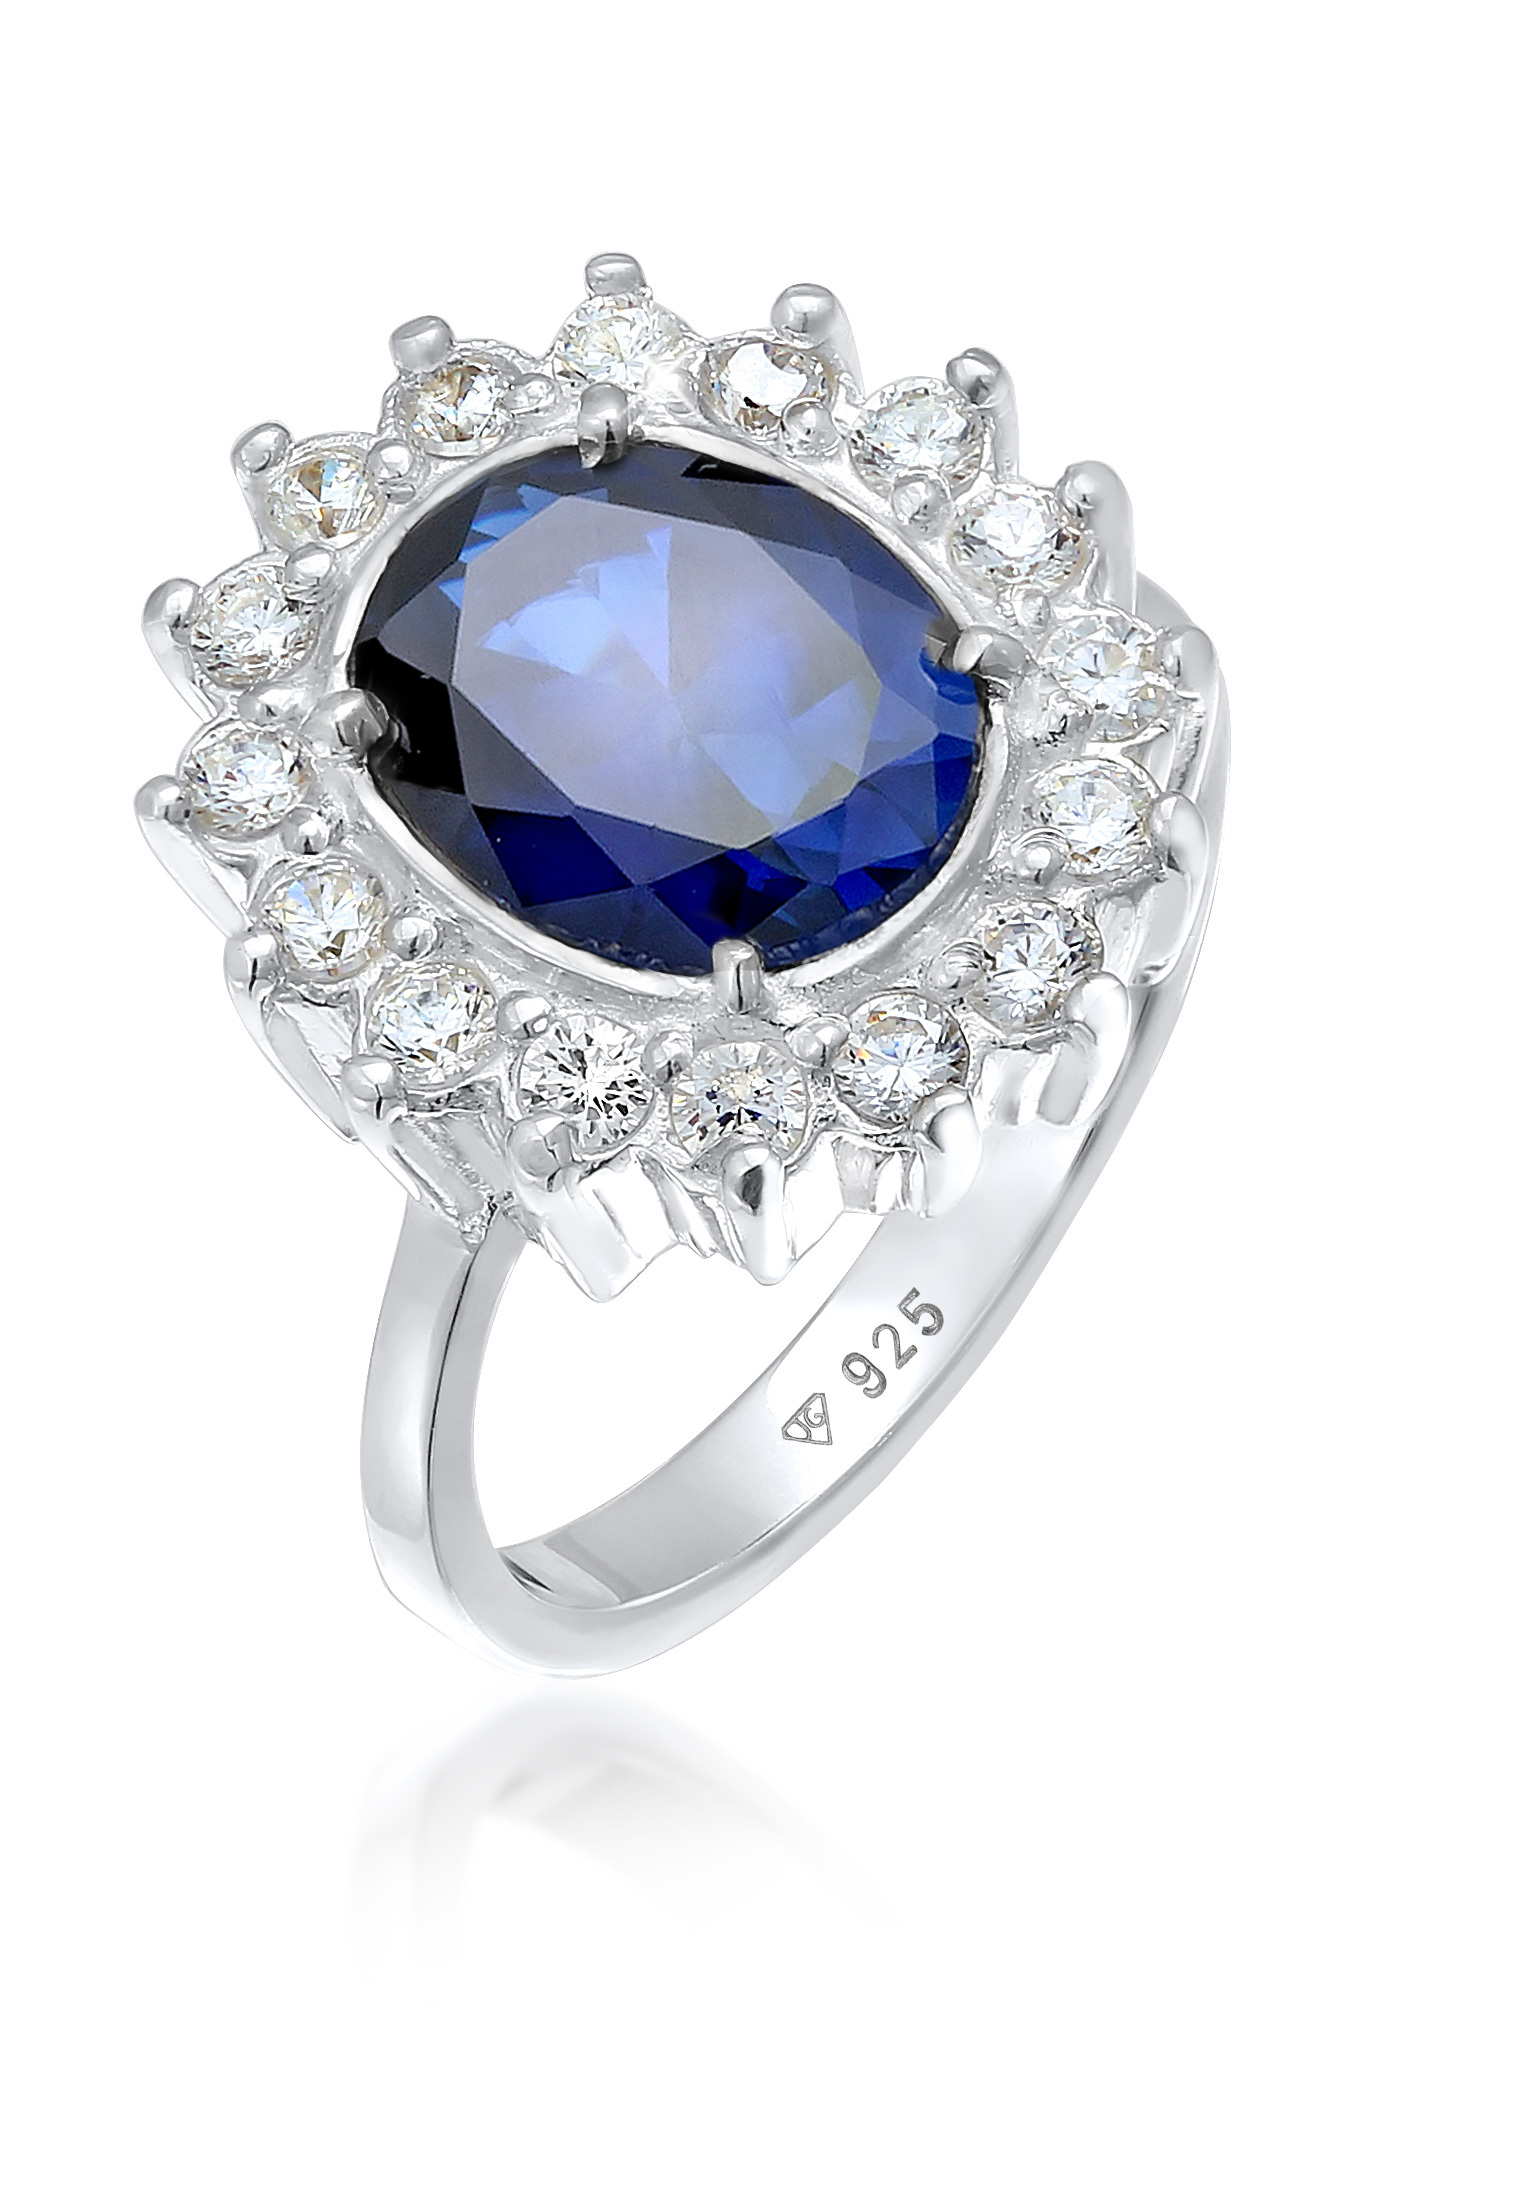 Ring   Saphir ( Blau )   925er Sterling Silber